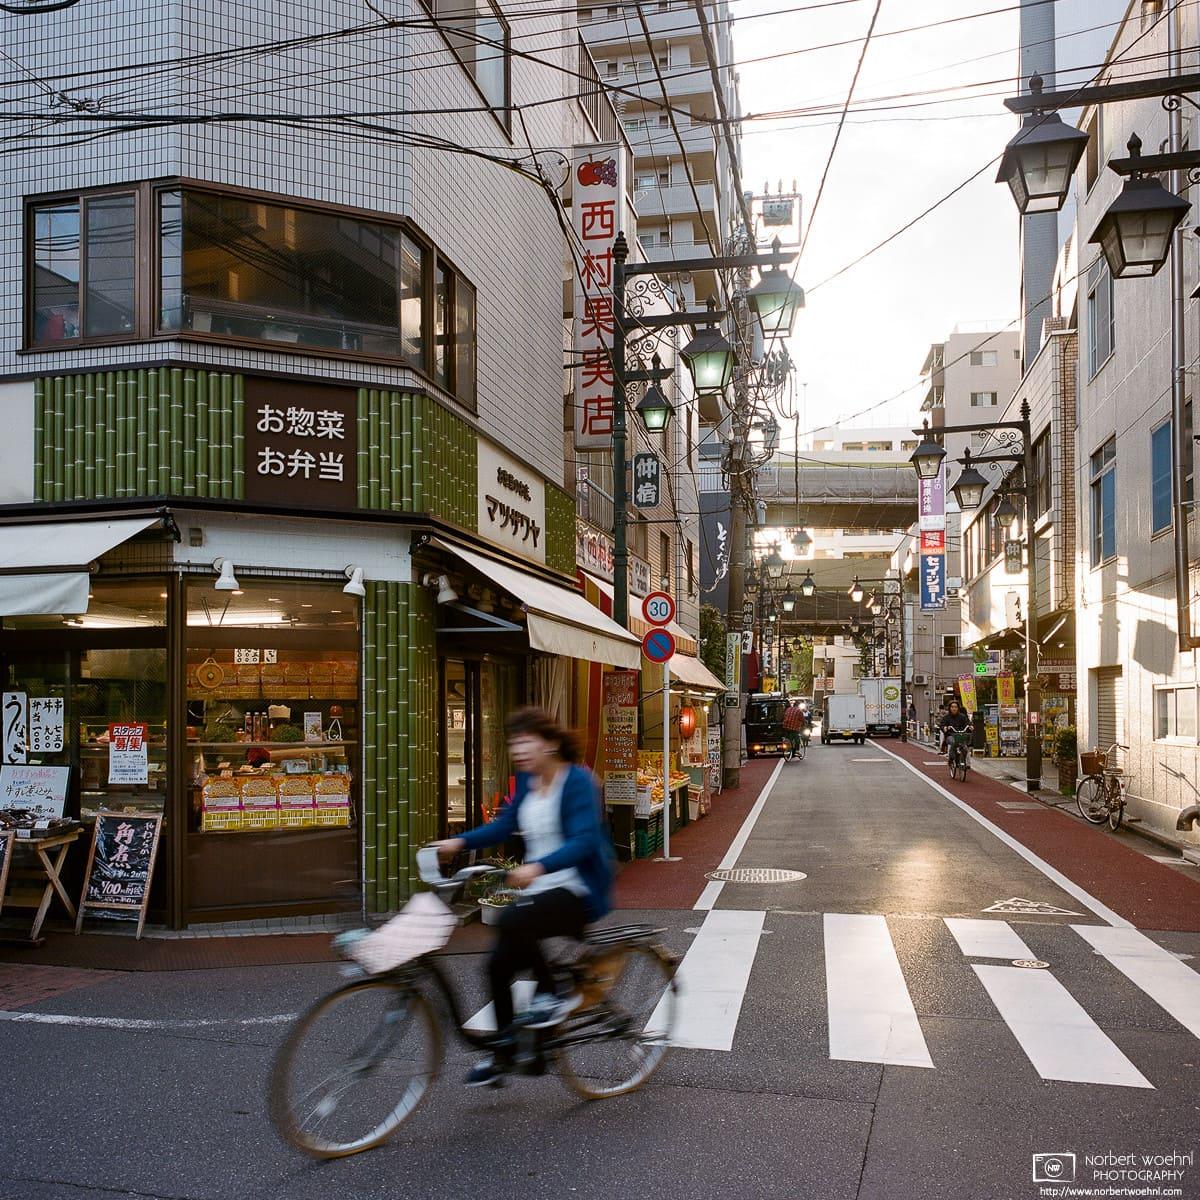 Late afternoon at a street corner in Nakajuku, a friendly neighborhood in Tokyo's Itabashi-ku.